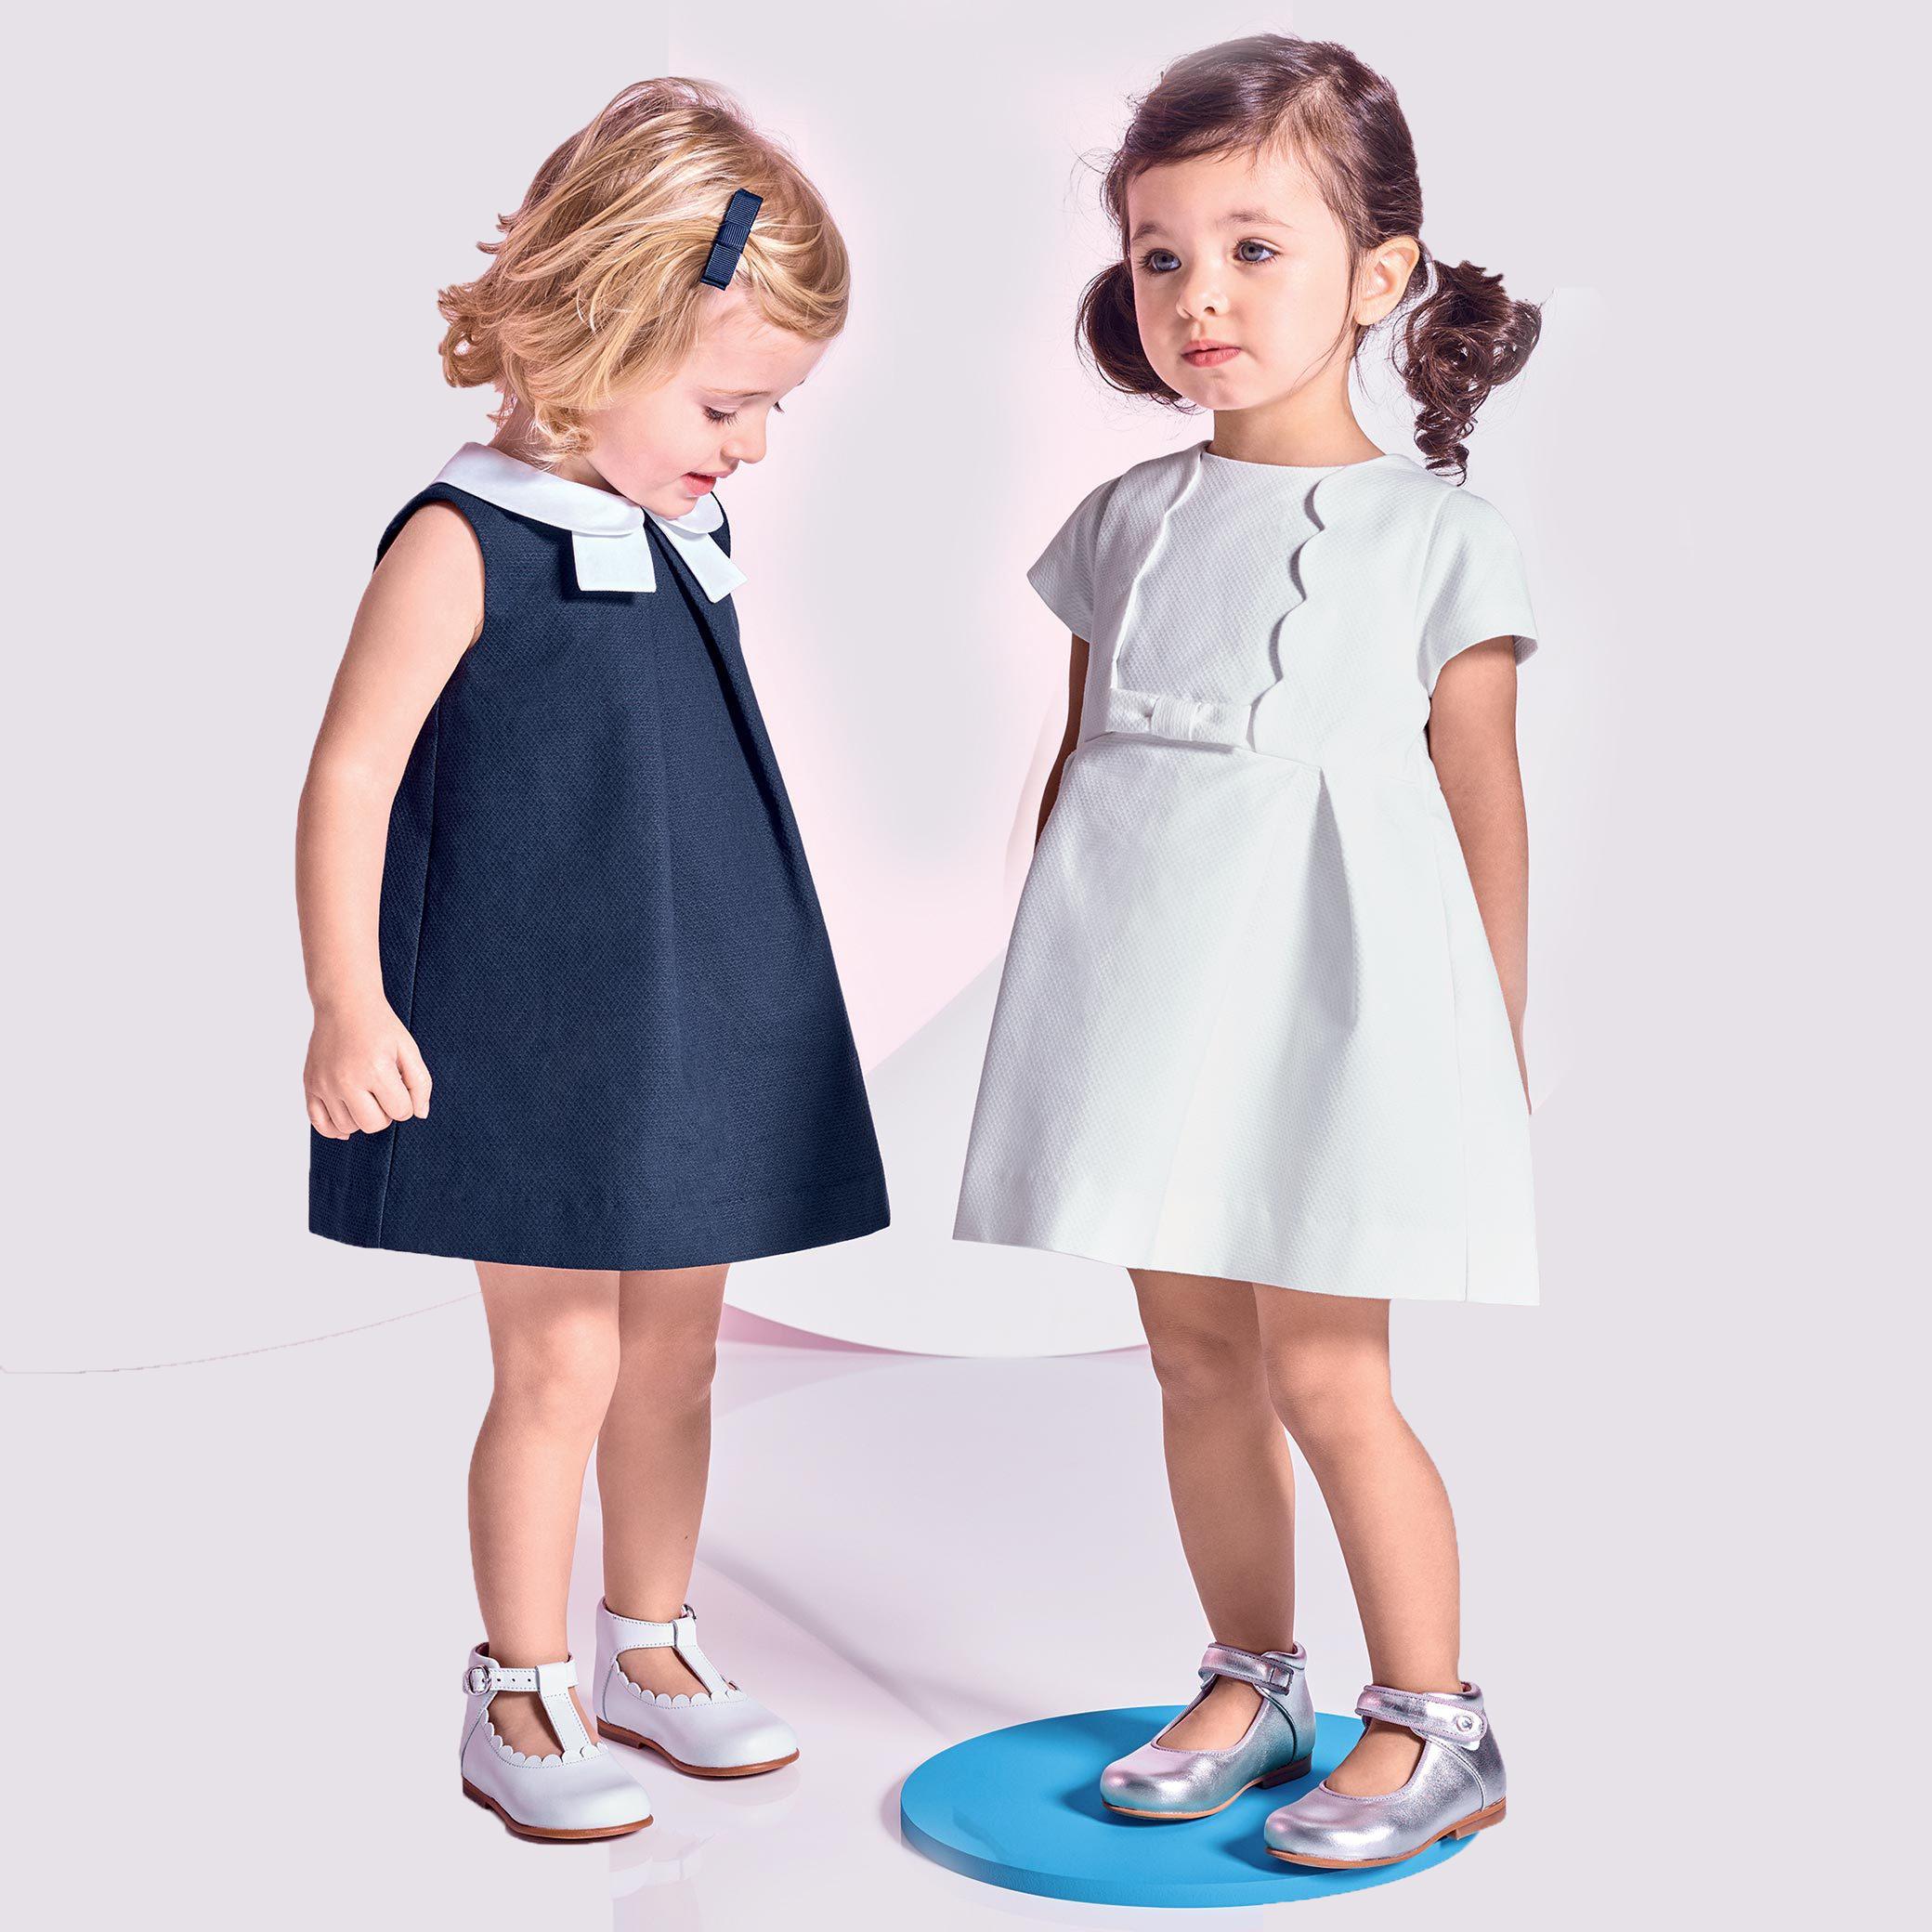 Guangzhou Wholesale Children Clothing Latest Children Dress Designs Kids  Fashion Girl Dress Manufacturer - Buy Fashion Design Small Girls  Dress,Spring